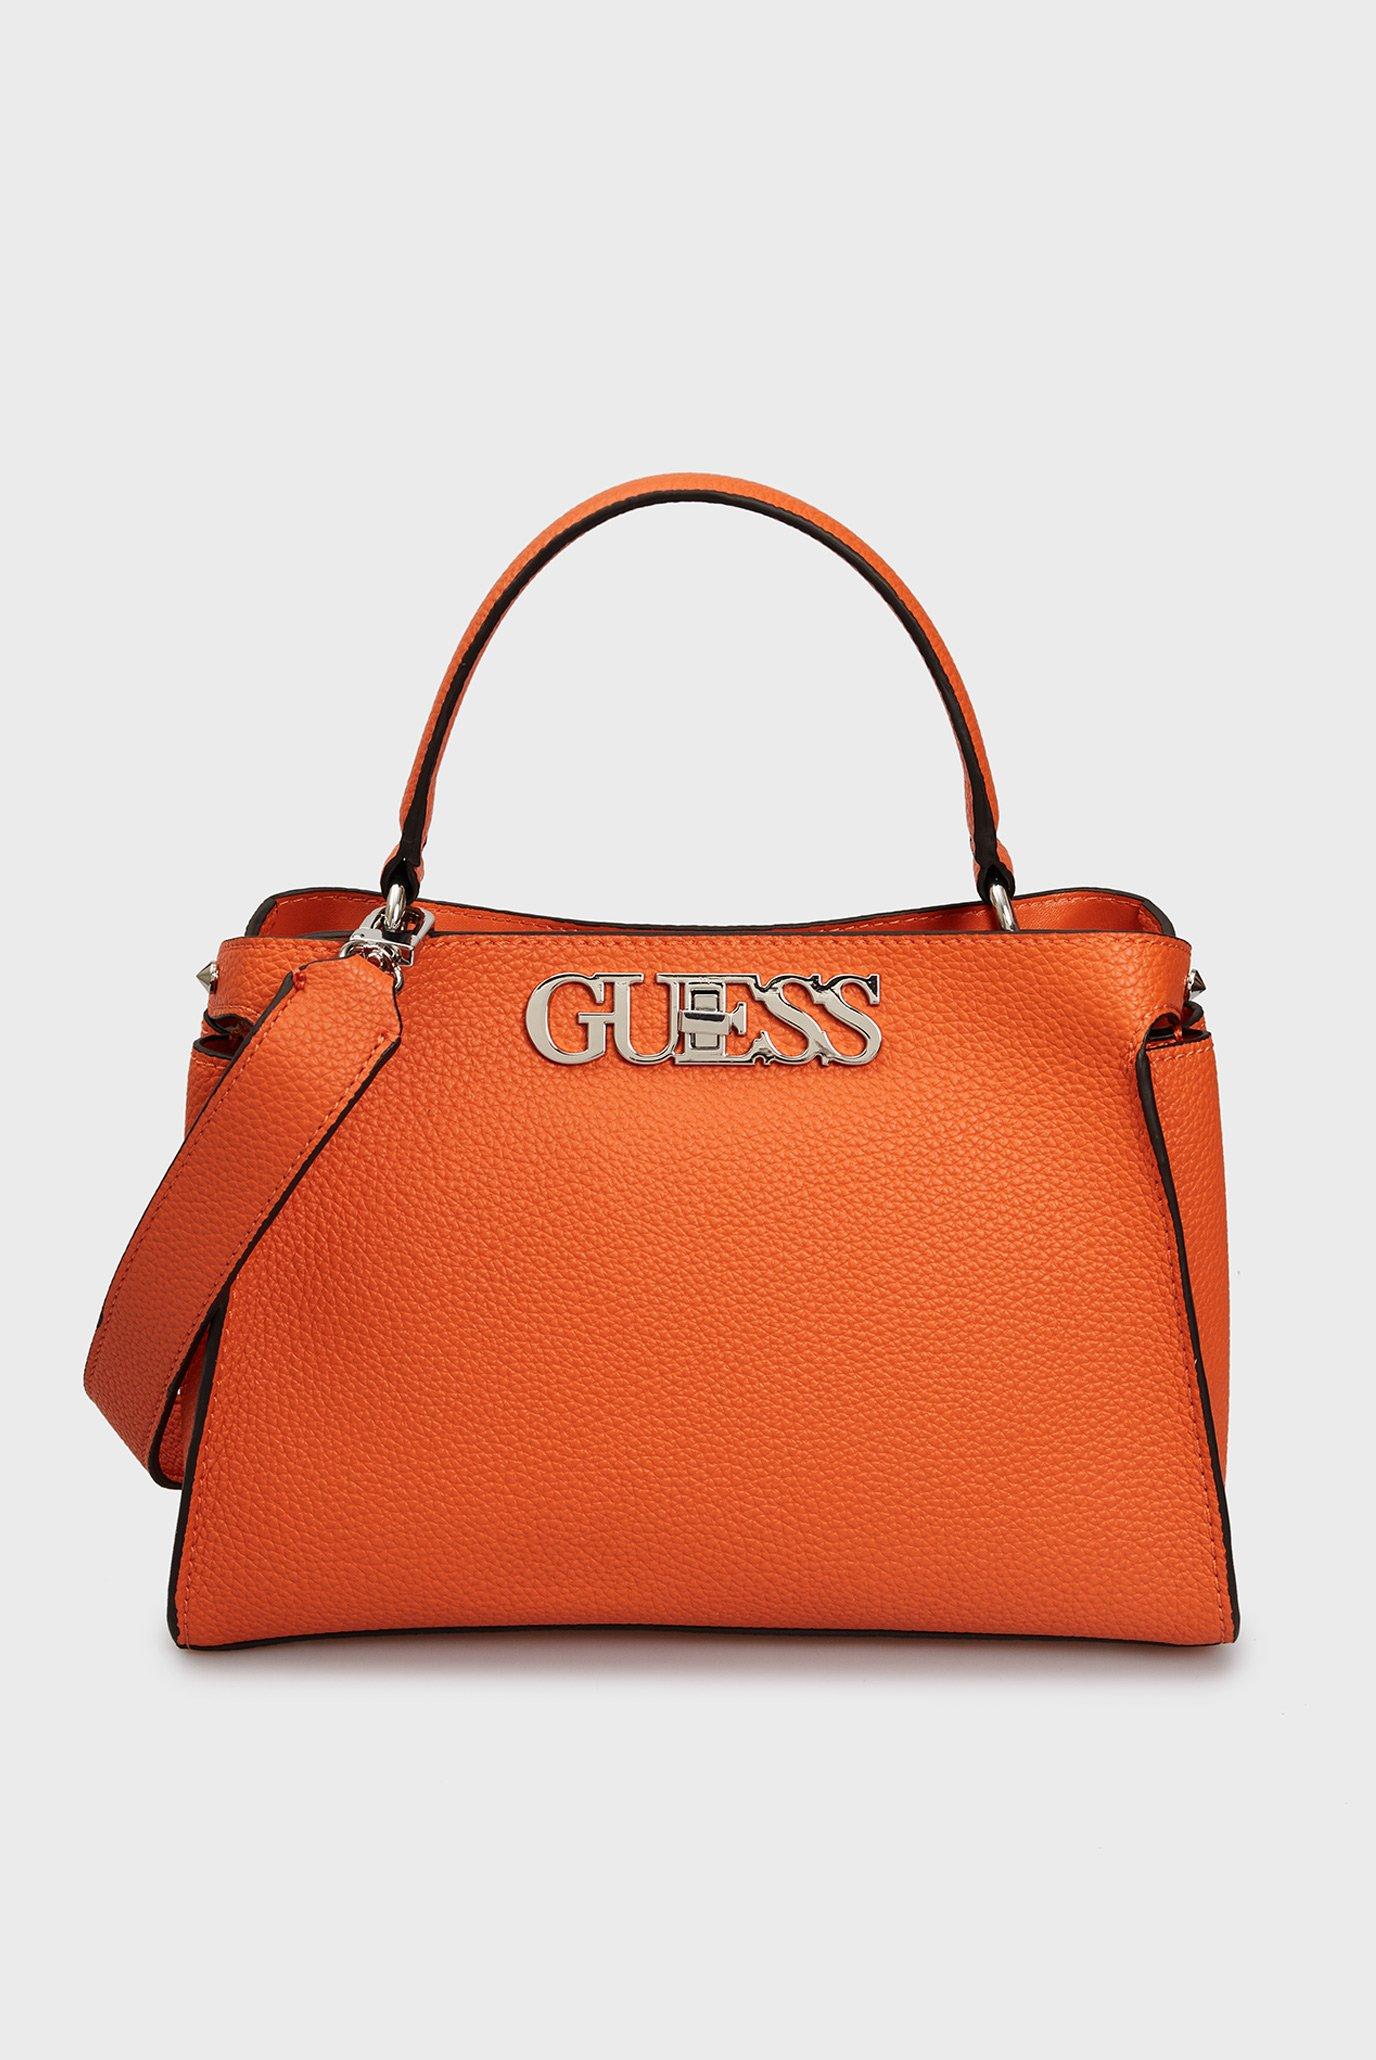 Жіноча помаранчева сумка через плече HONEY CHAIN CROSSOVER 1